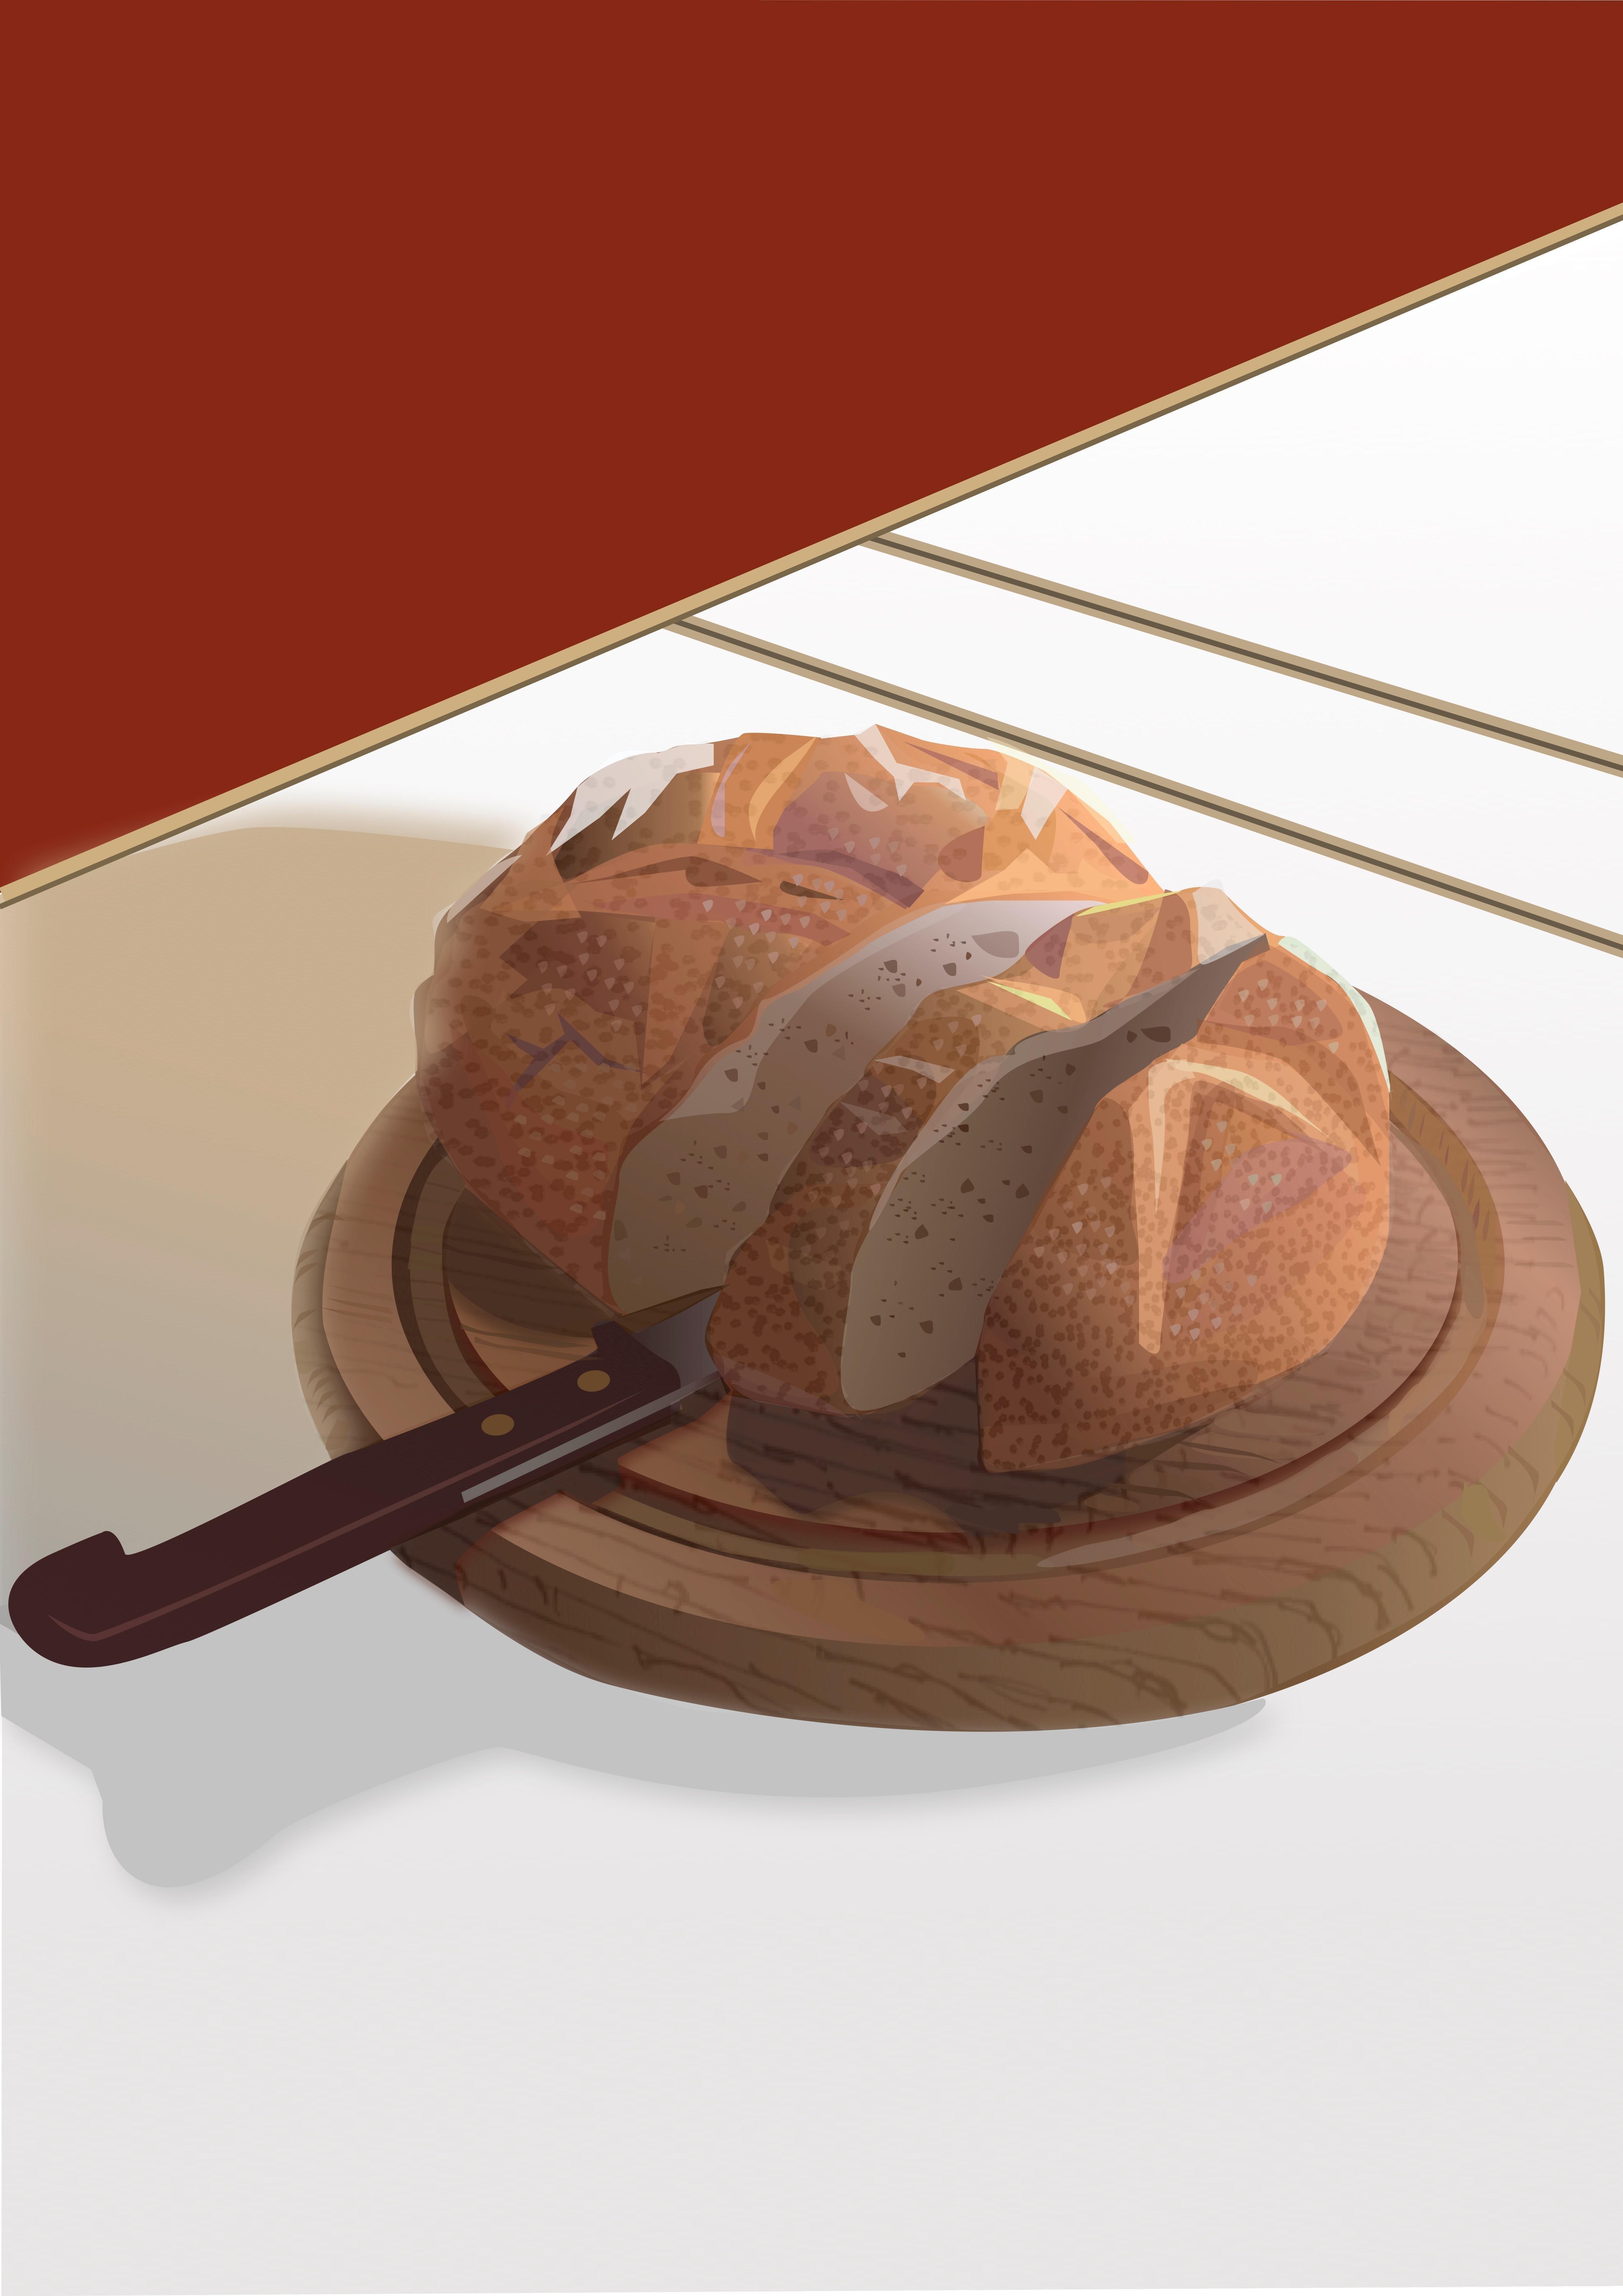 Bread- Contemporary Eco Pop art, digital print on paper